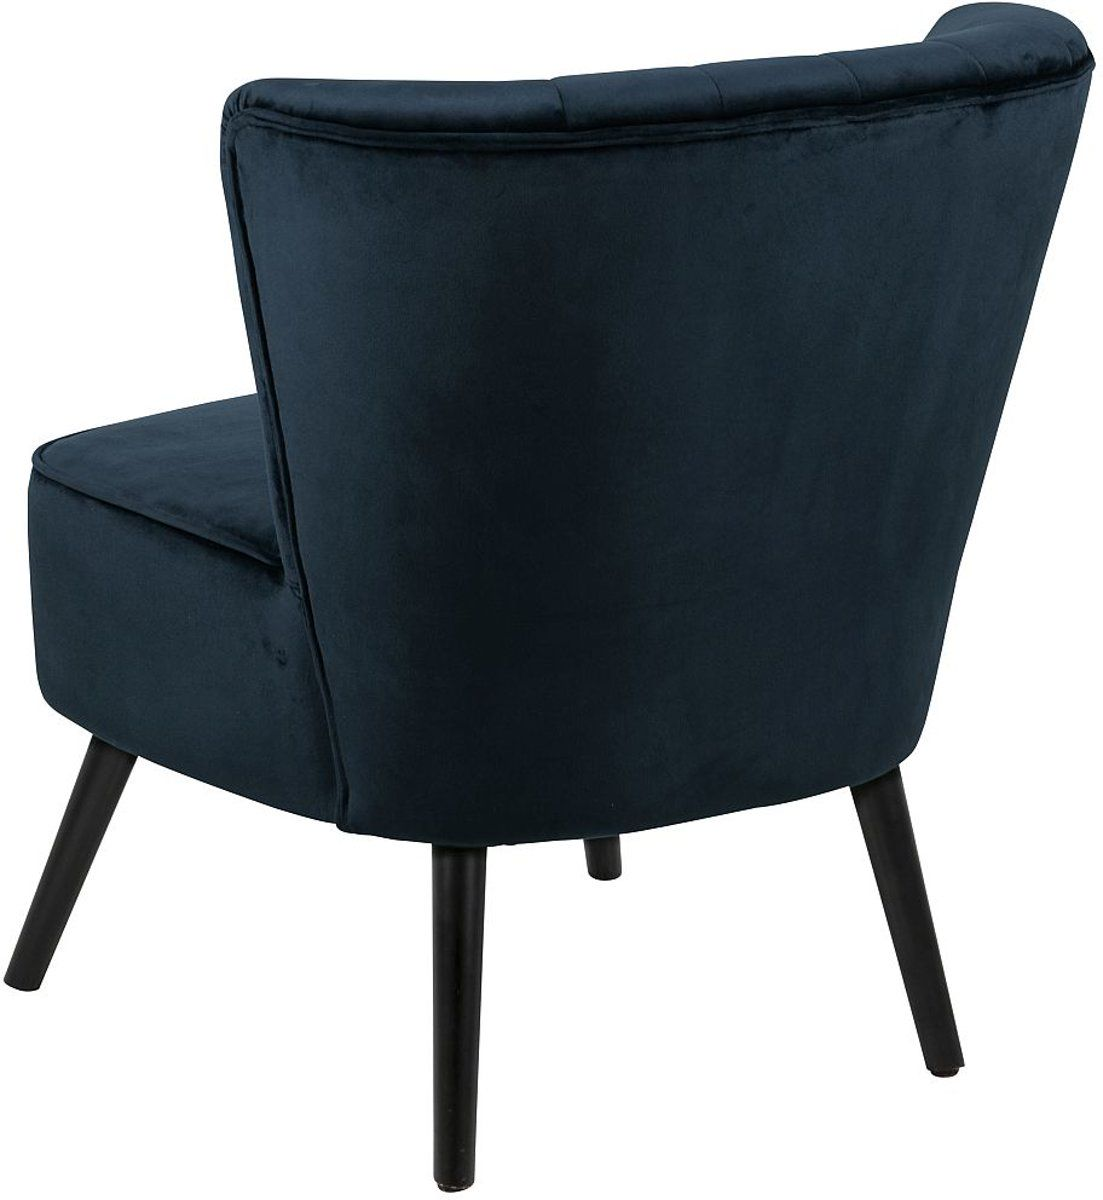 emma-blauw-velours-fauteuil-1